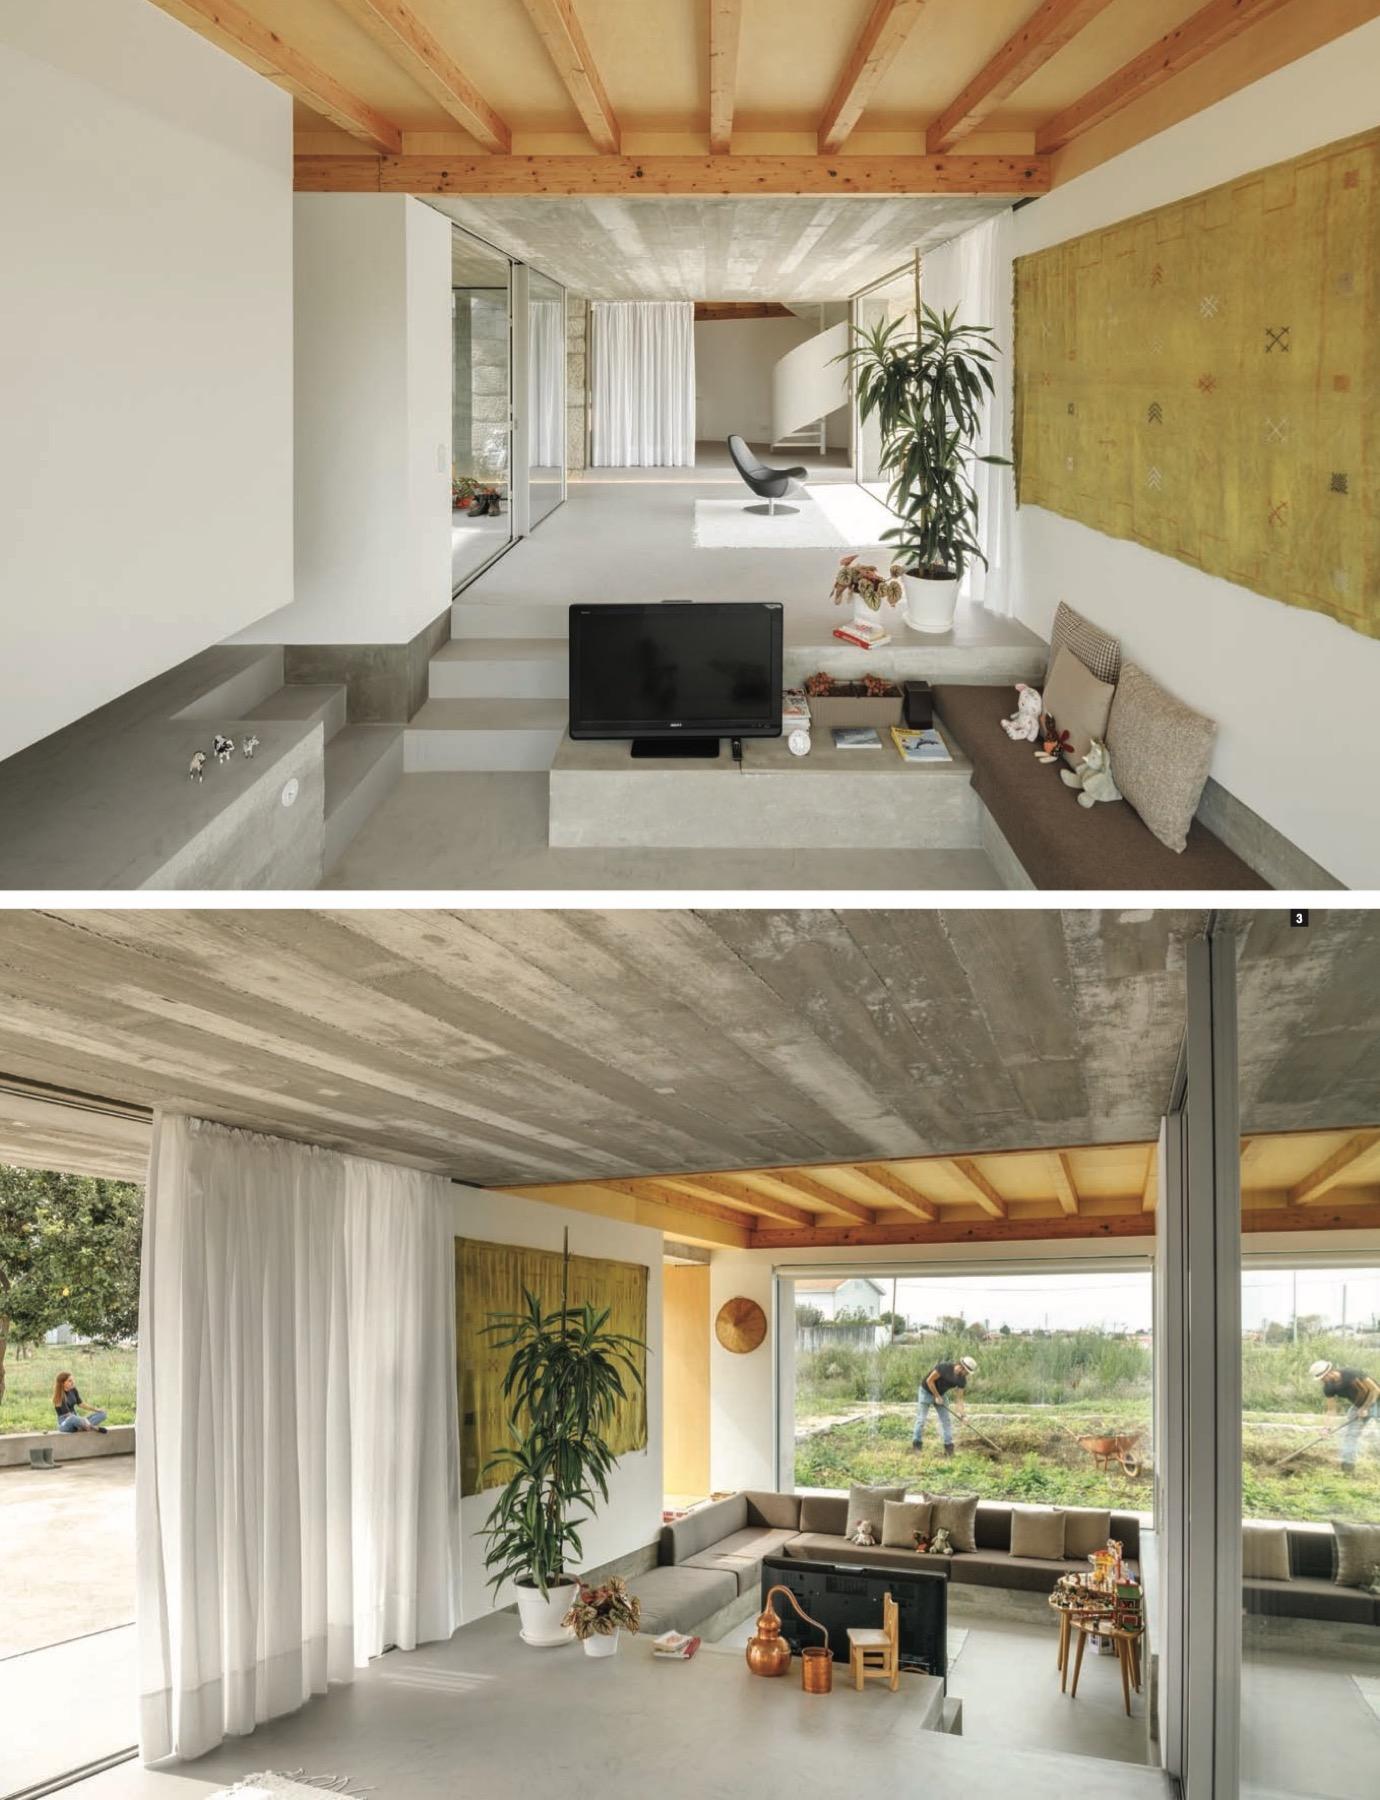 INTERIORS KOREA 414 casa rio paulo merlini ivo tavares studio 6 7